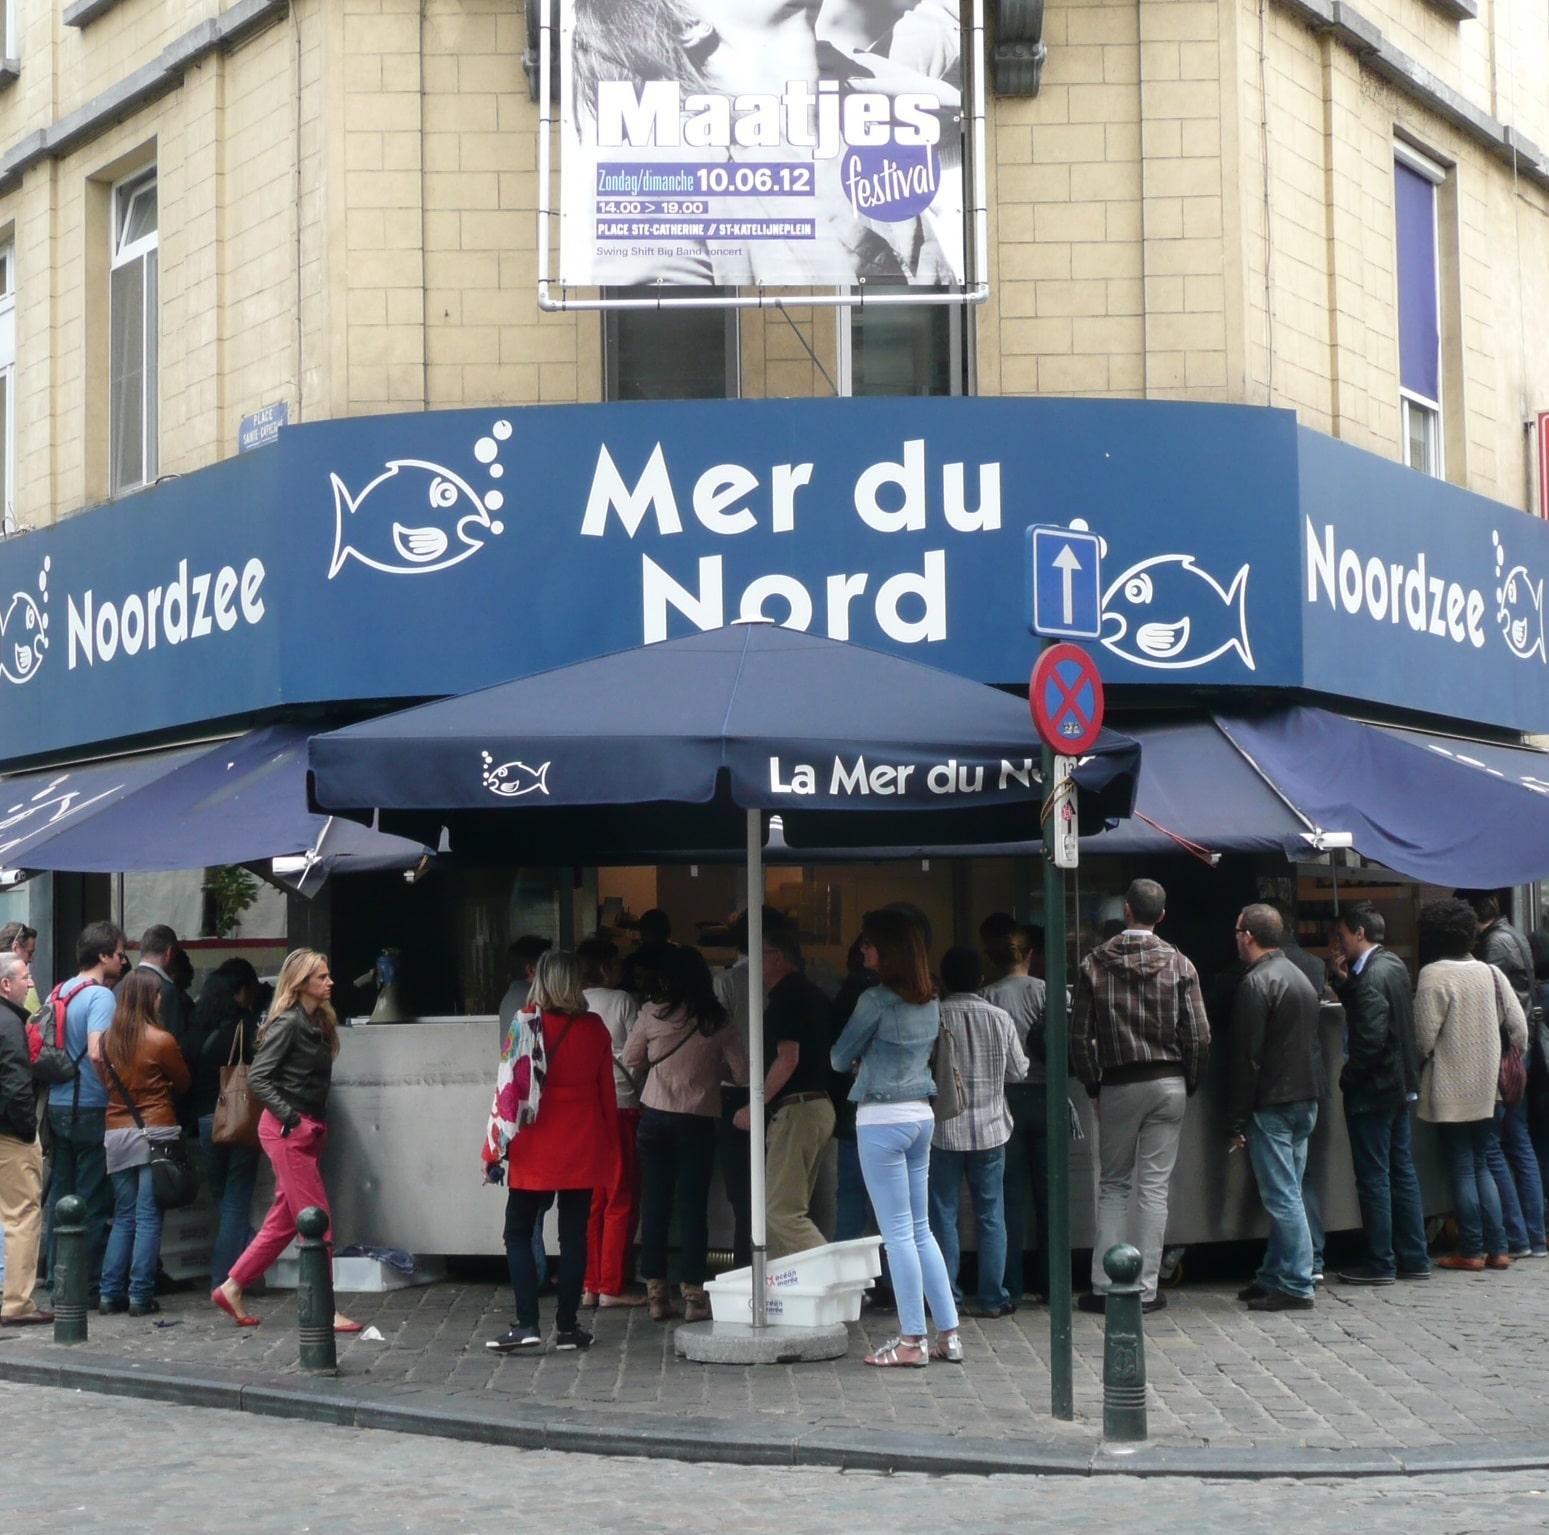 Restaurants in Brussels 1